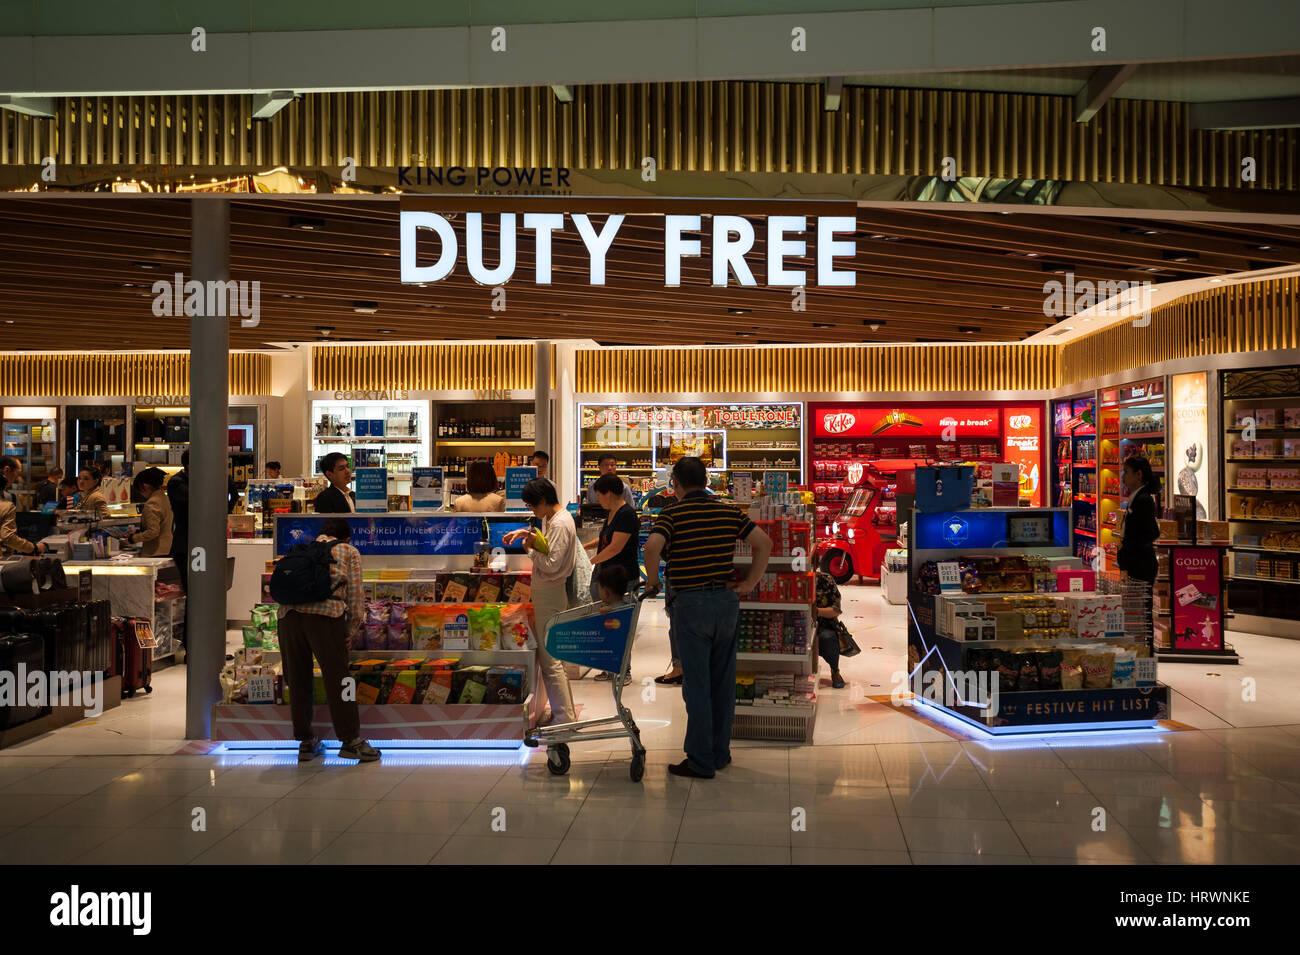 25.01.2017, Bangkok, Thailand, Asien - einen duty free Shop im Transit-Bereich am Flughafen Suvarnabhumi in Bangkok. Stockbild